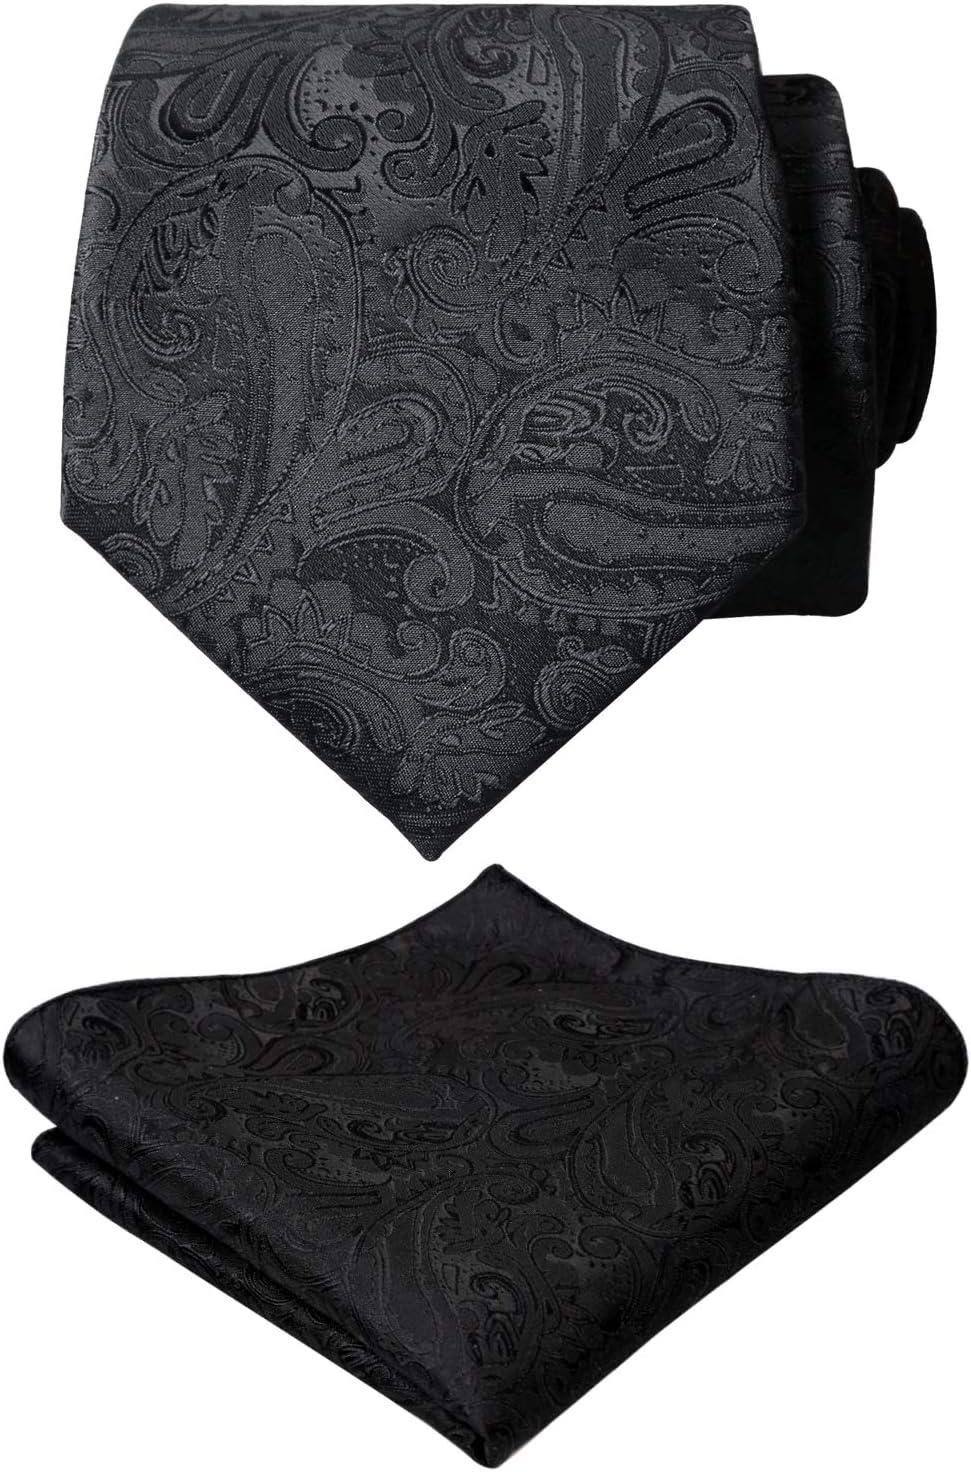 New Men/'s Polyester Woven Neck Tie necktie /& hankie set Purple paisley wedding